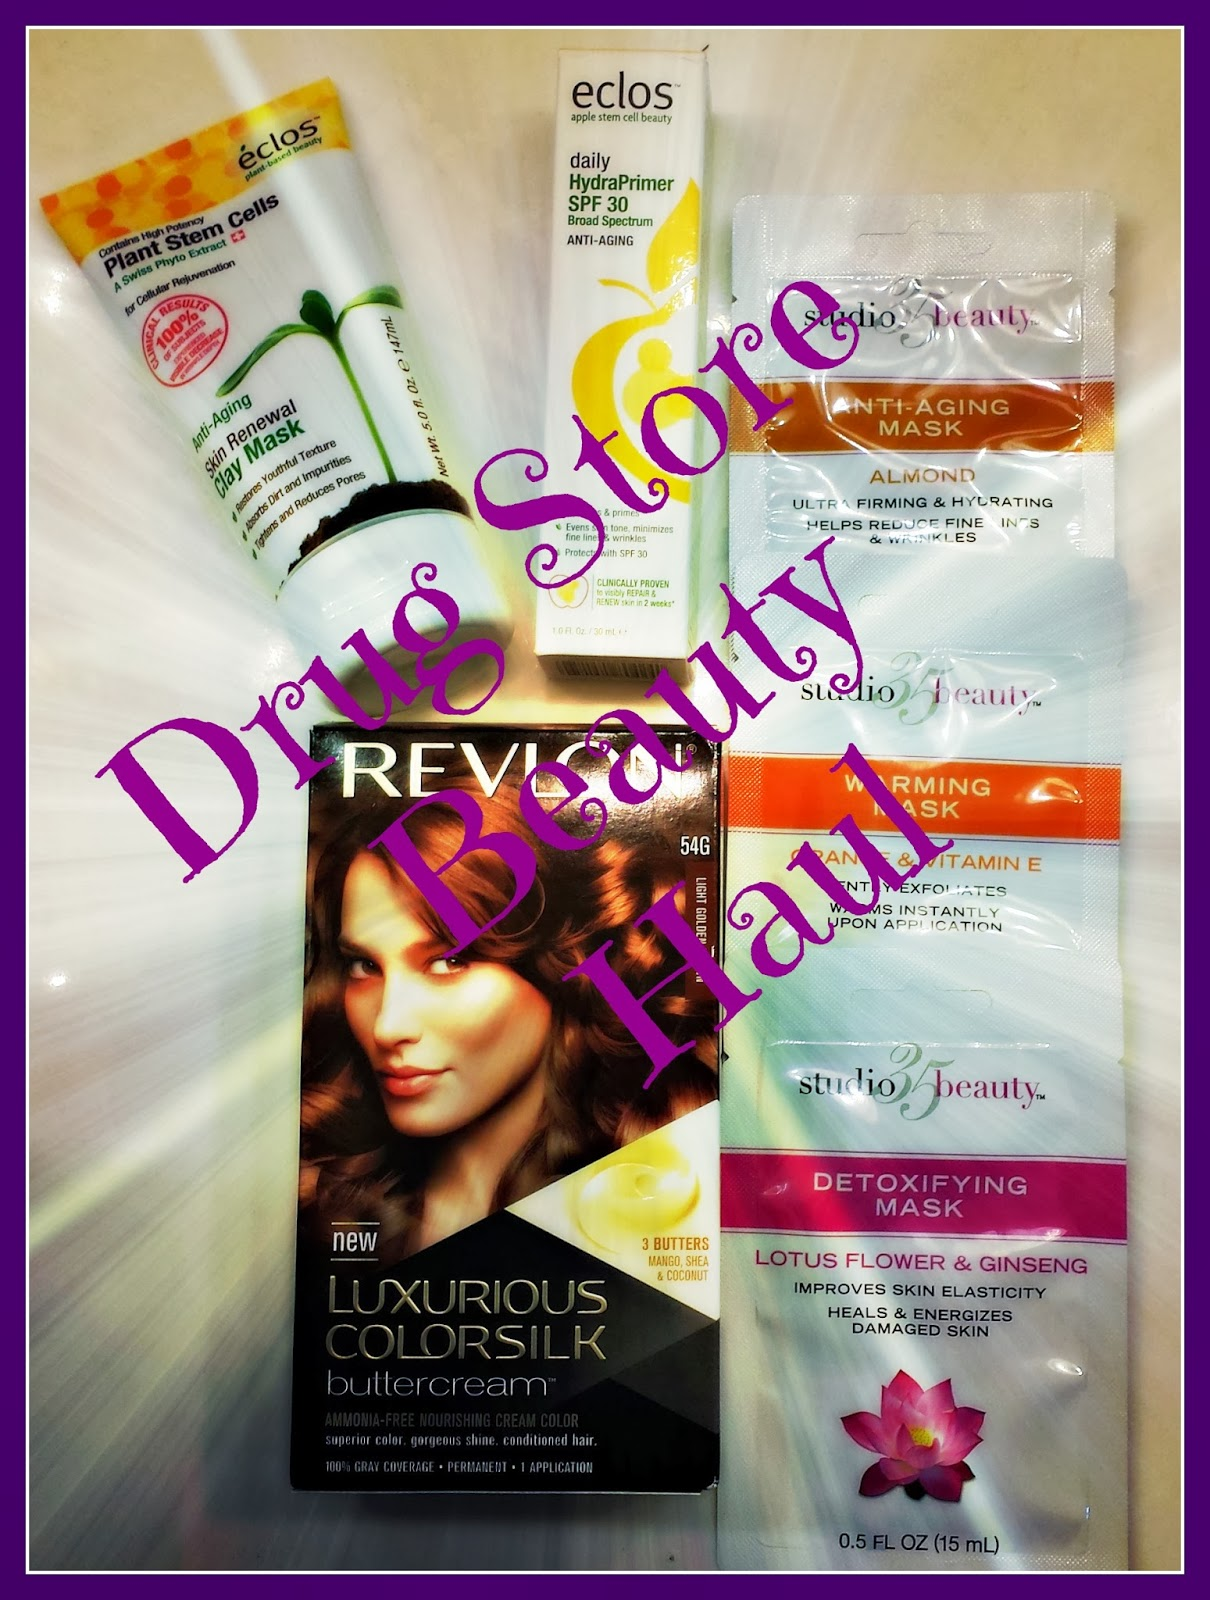 Eclos Skin Care Walgreens